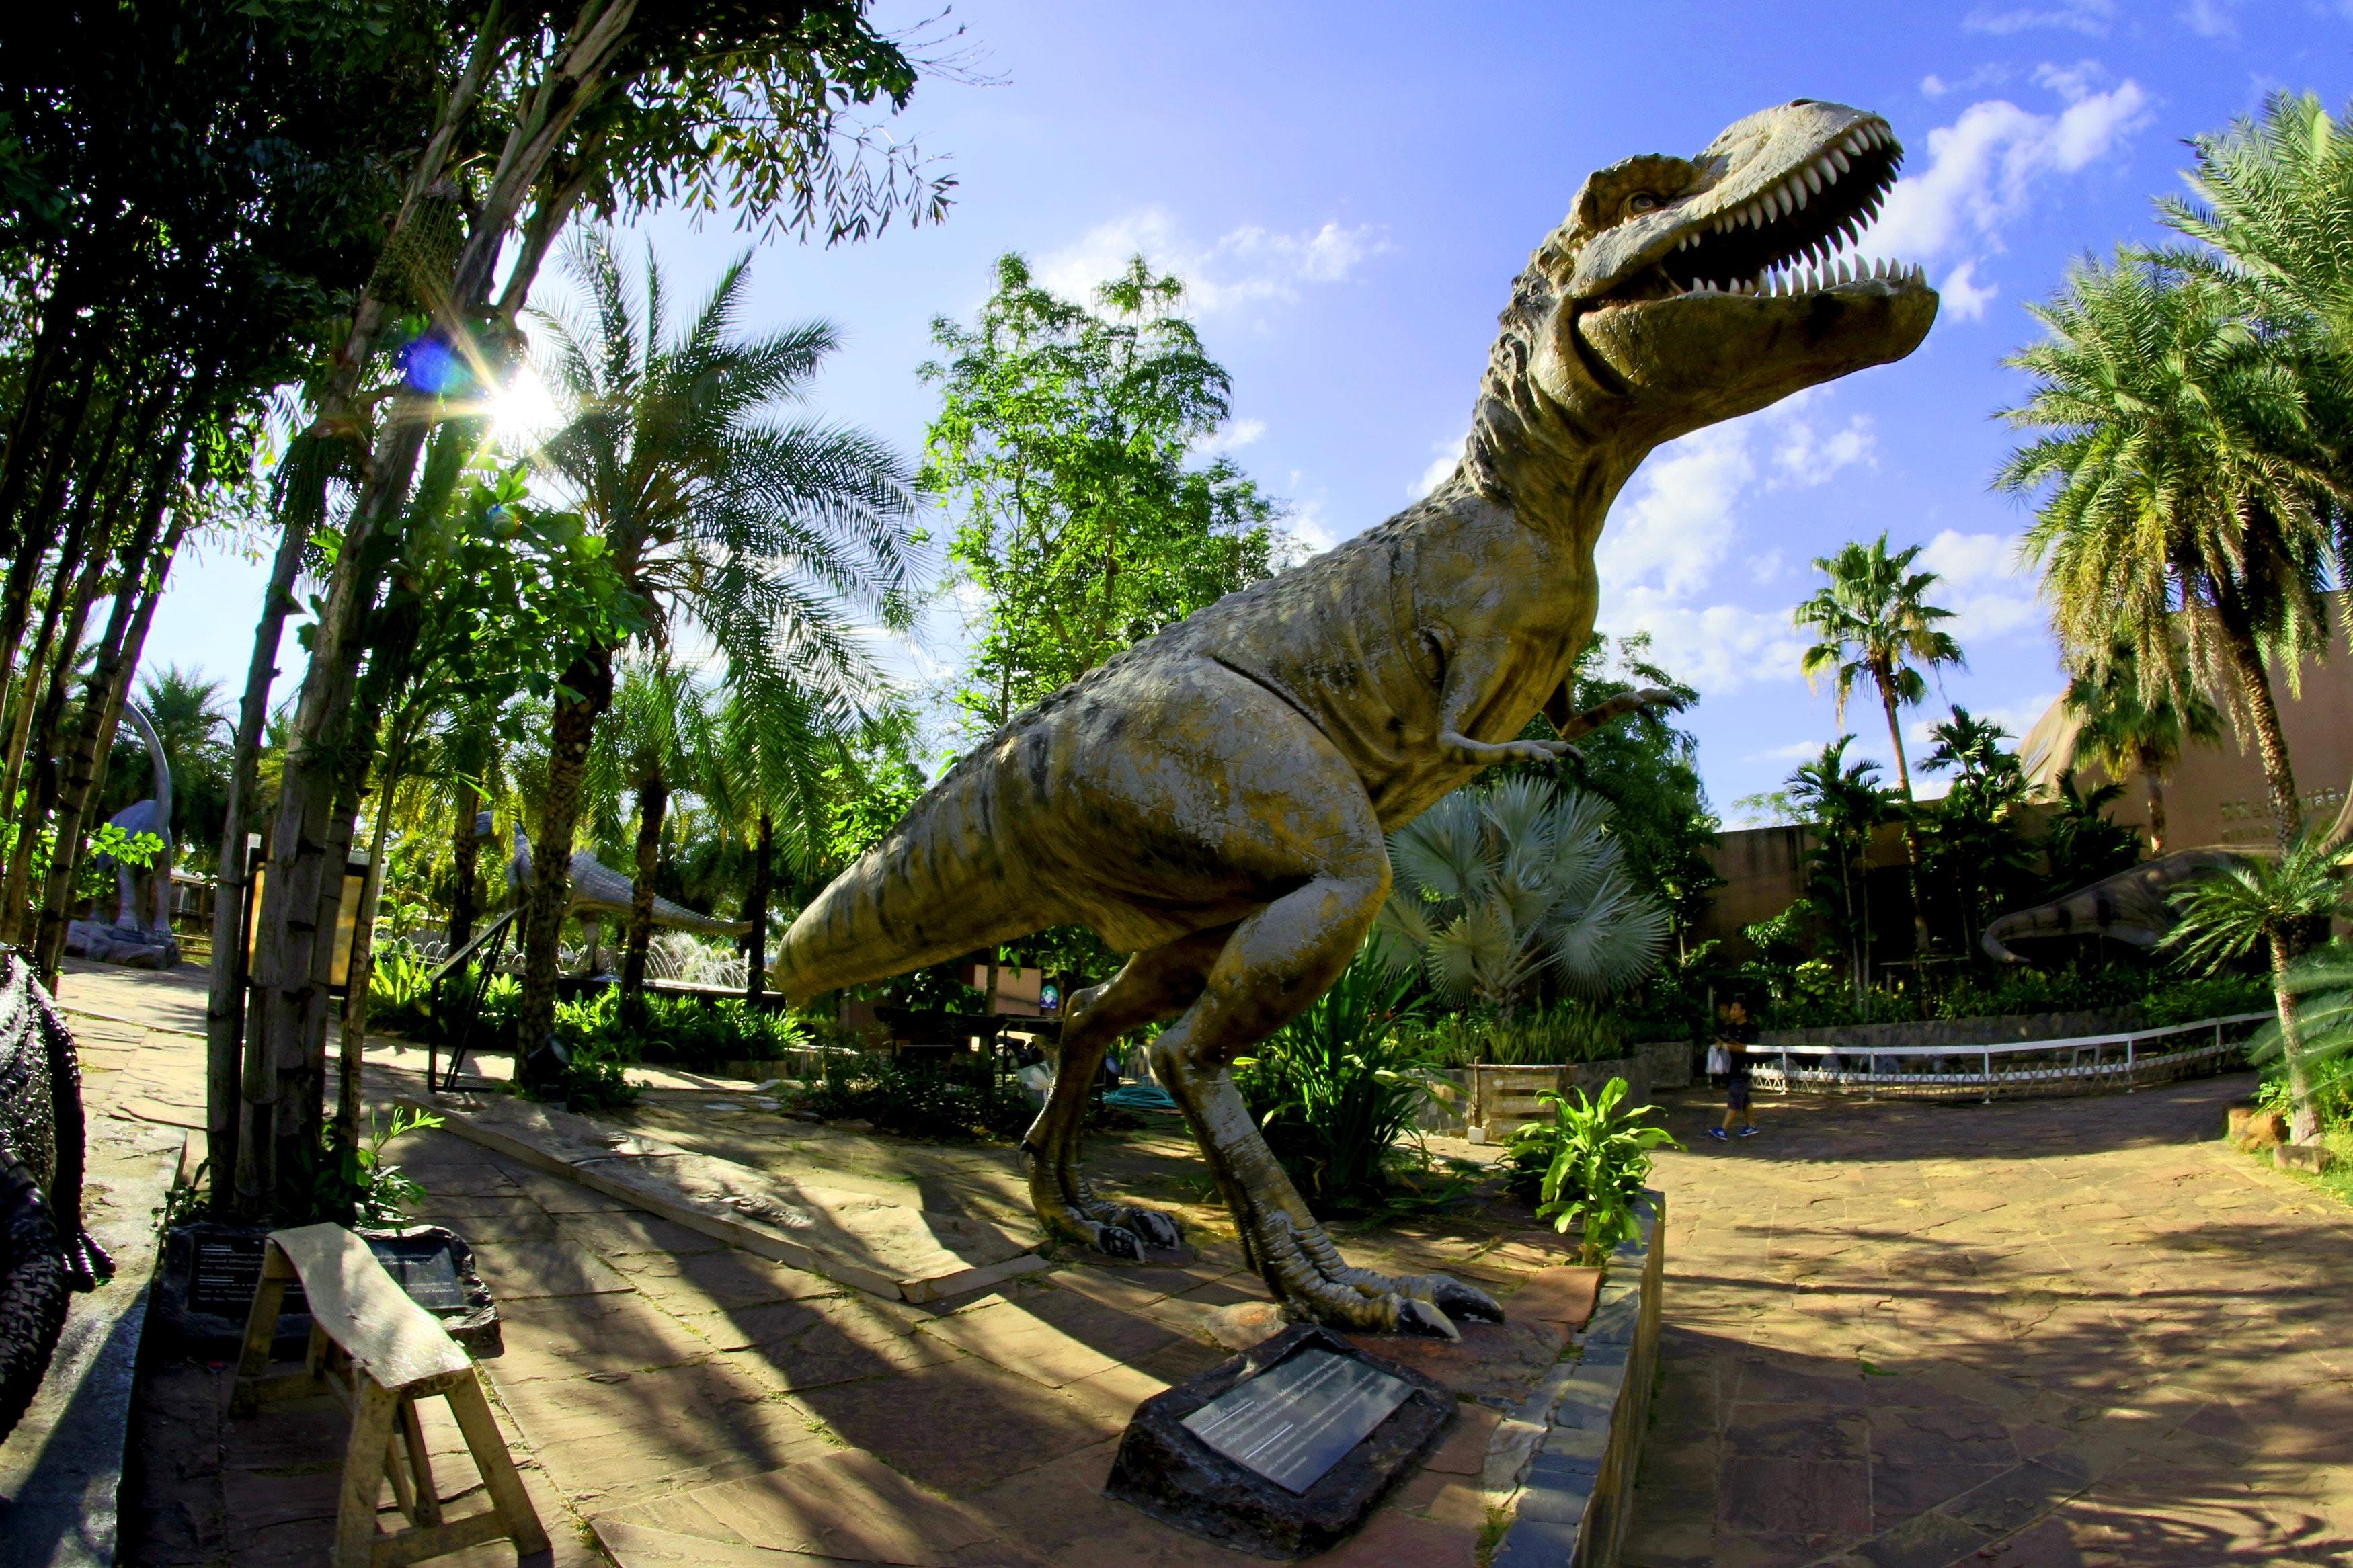 Dinosaur Statue, Animal, Sky, Research, Resort, HQ Photo